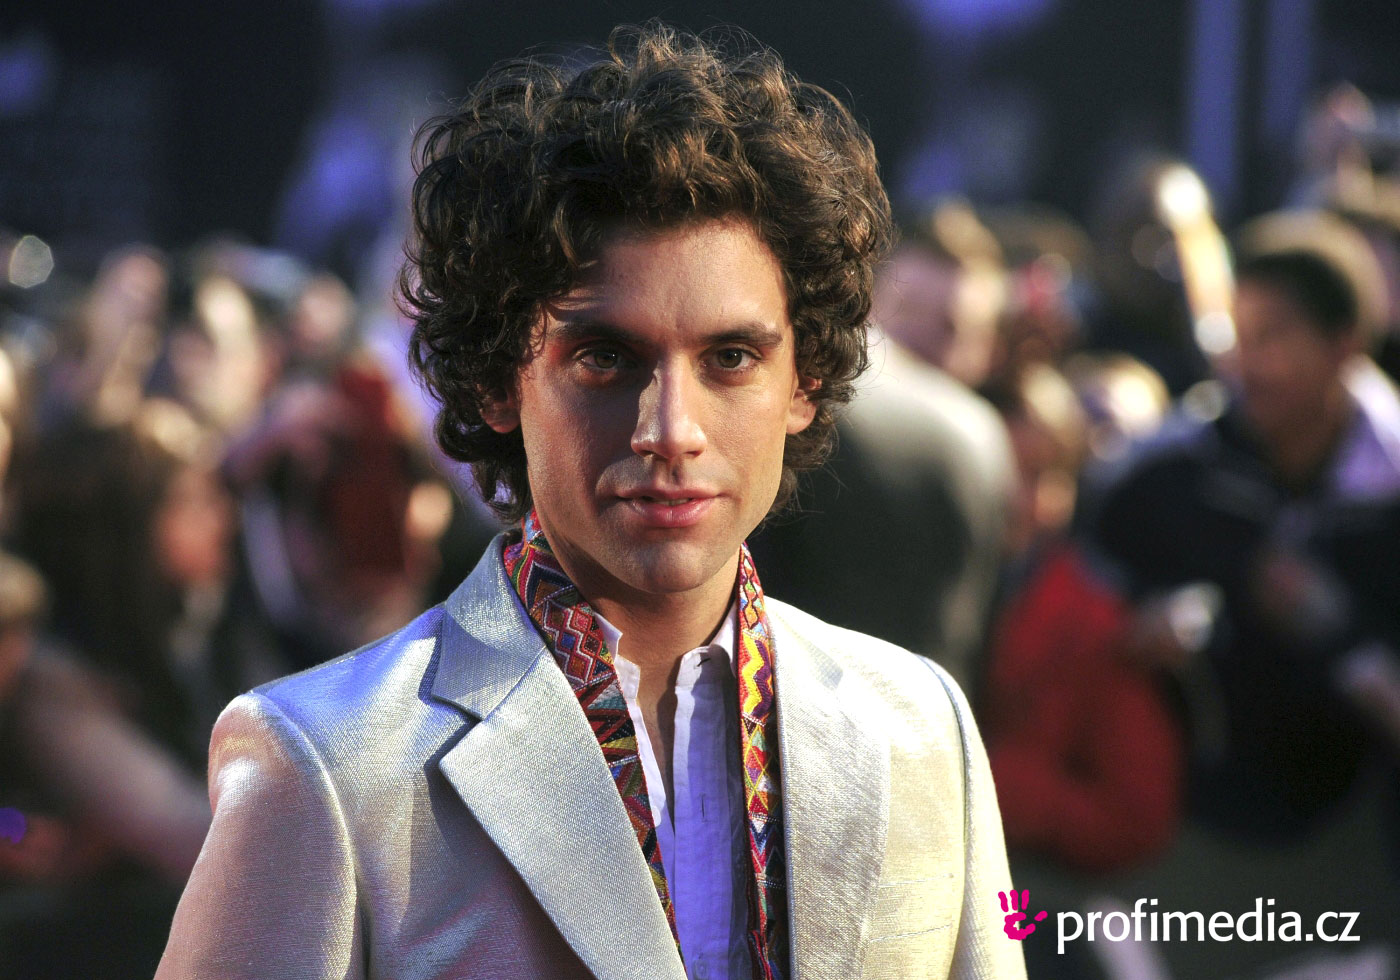 Mika Hairstyle Easyhairstyler